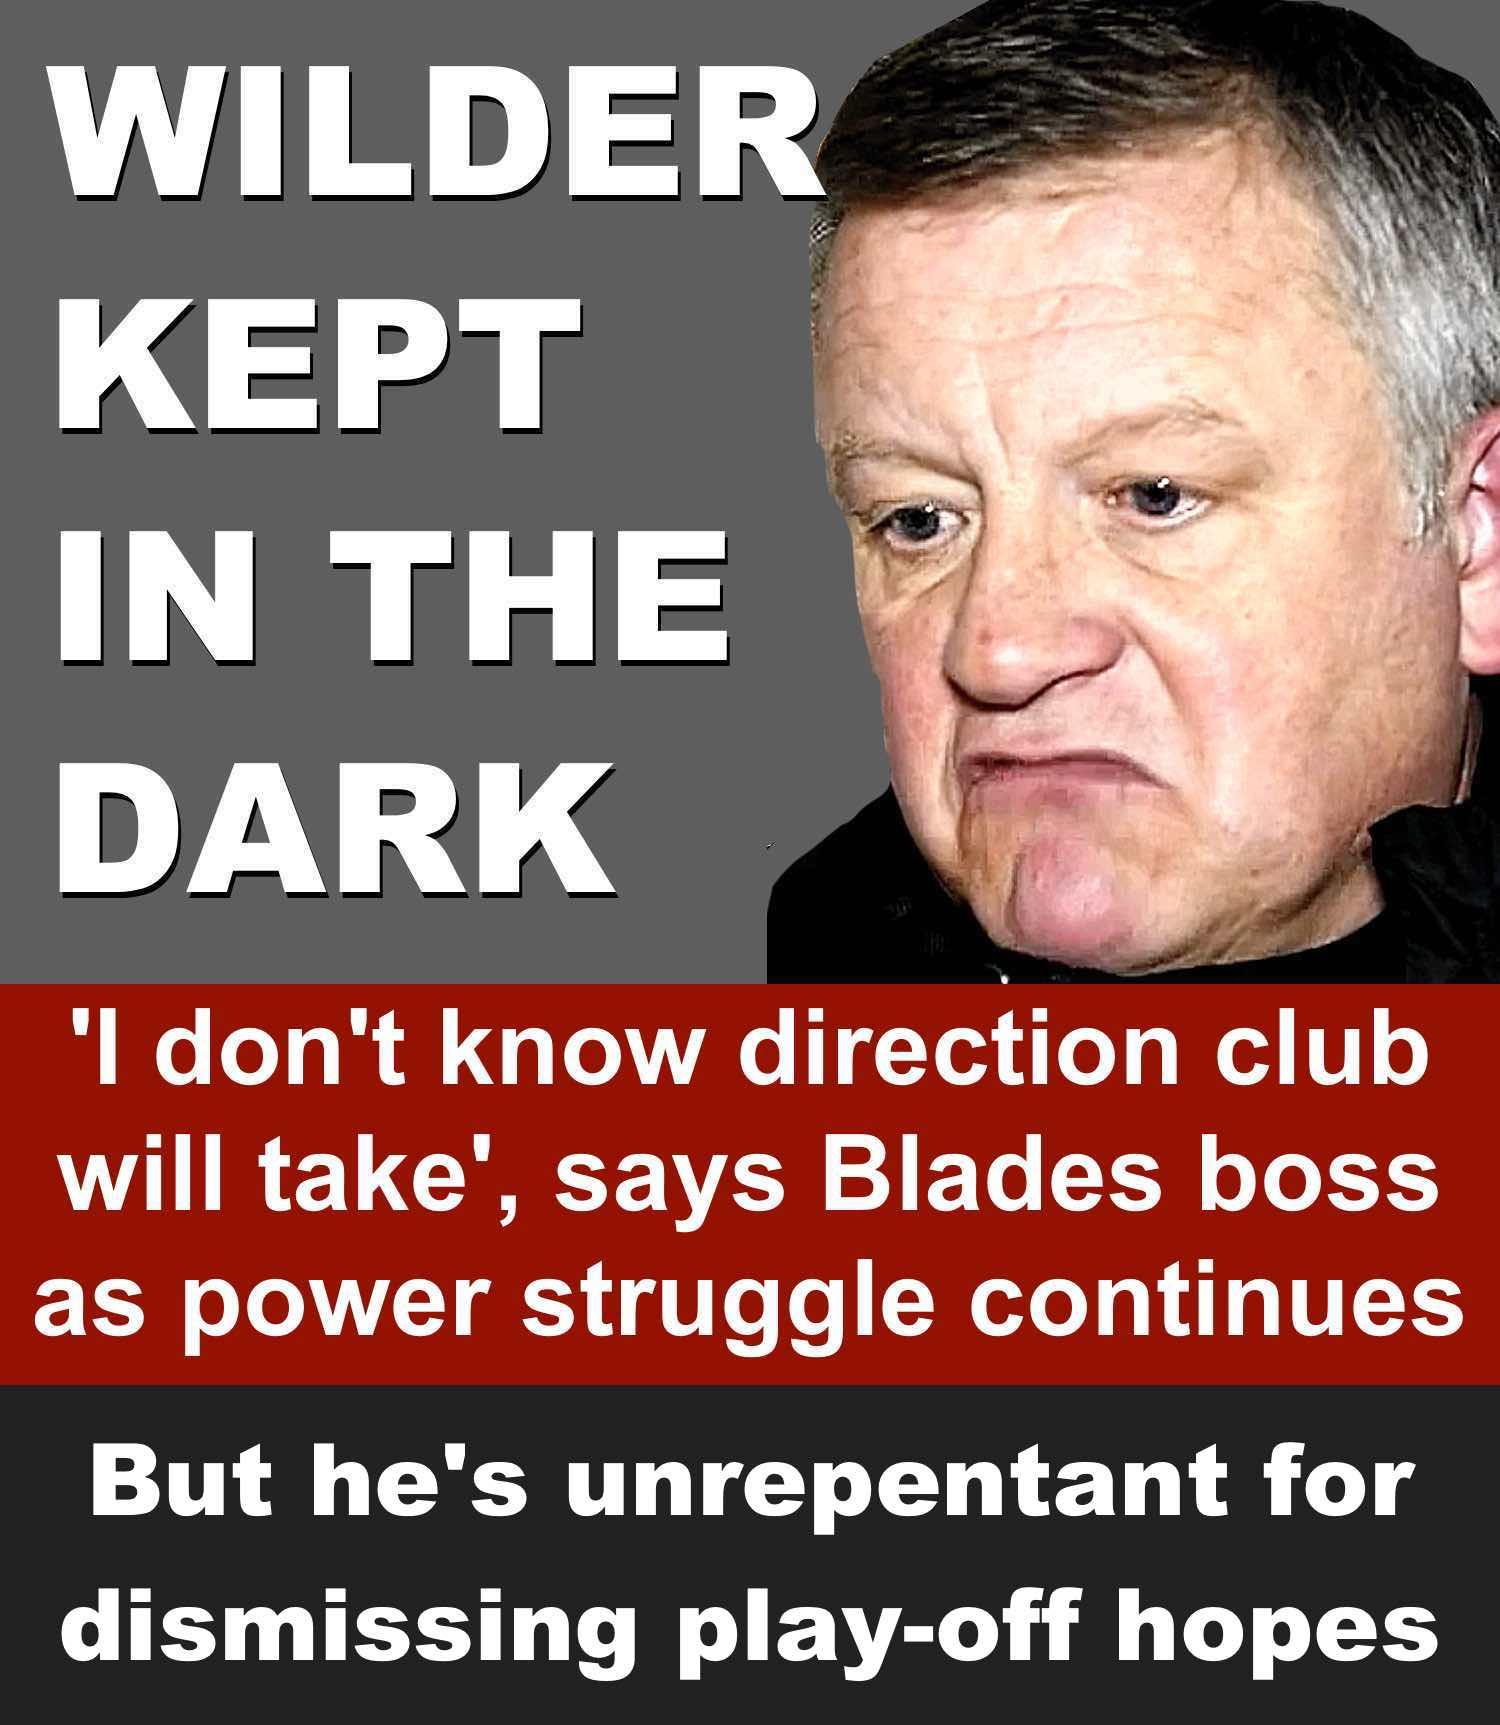 Sheffield United boss kept in dark in Bramall Lane power struggle